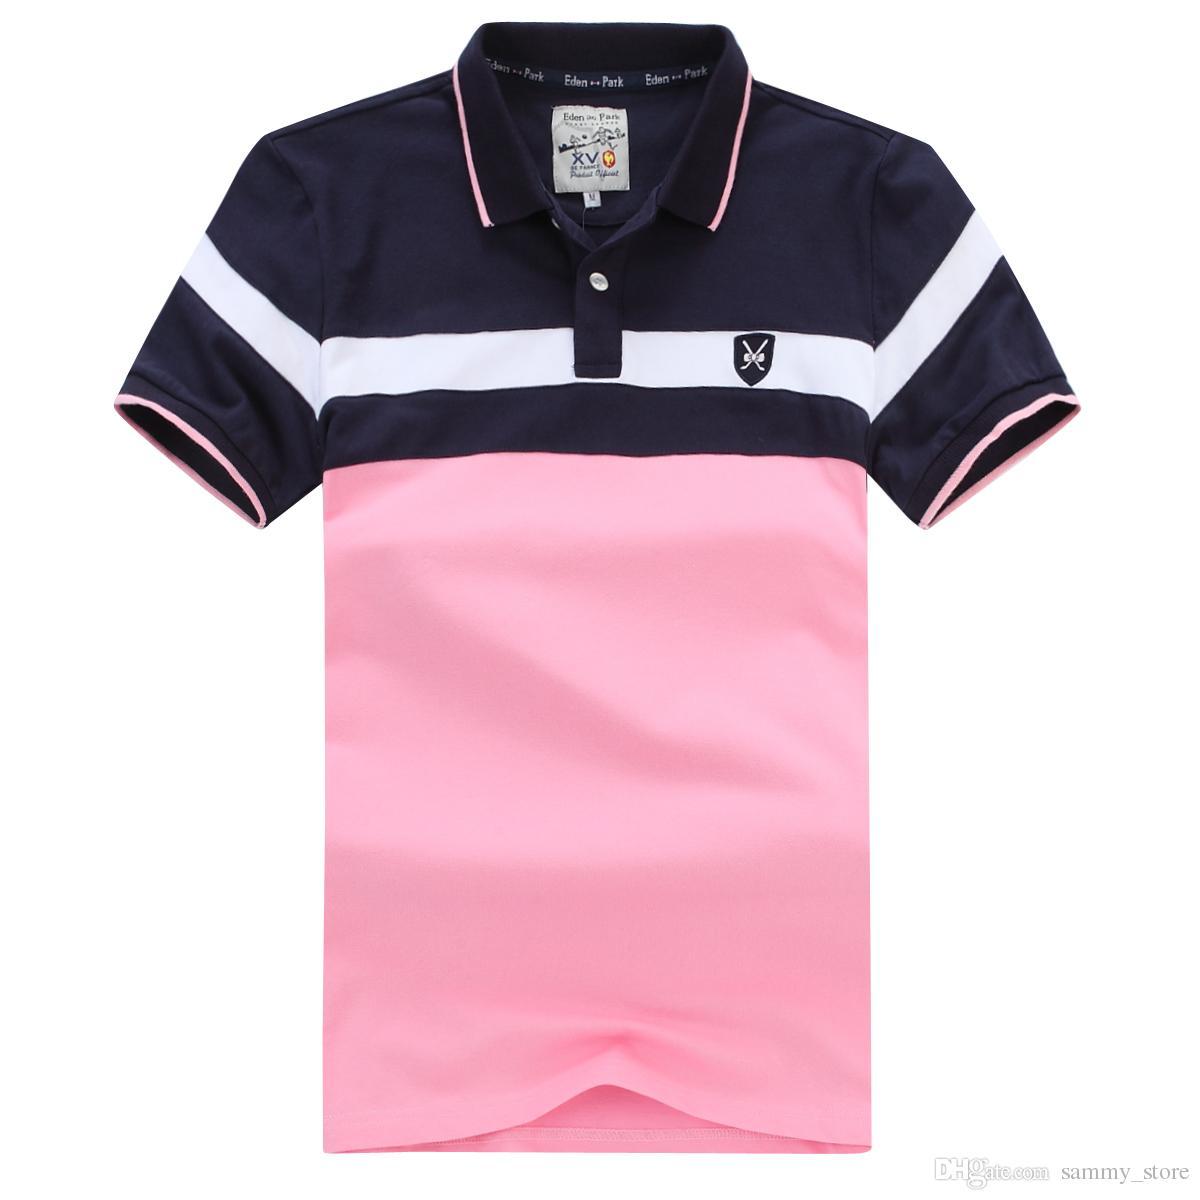 New Best Selling Eden Park Curto Polo For Men Bom Qualidade Fashion Design Big Size M L XL XXL XXXL